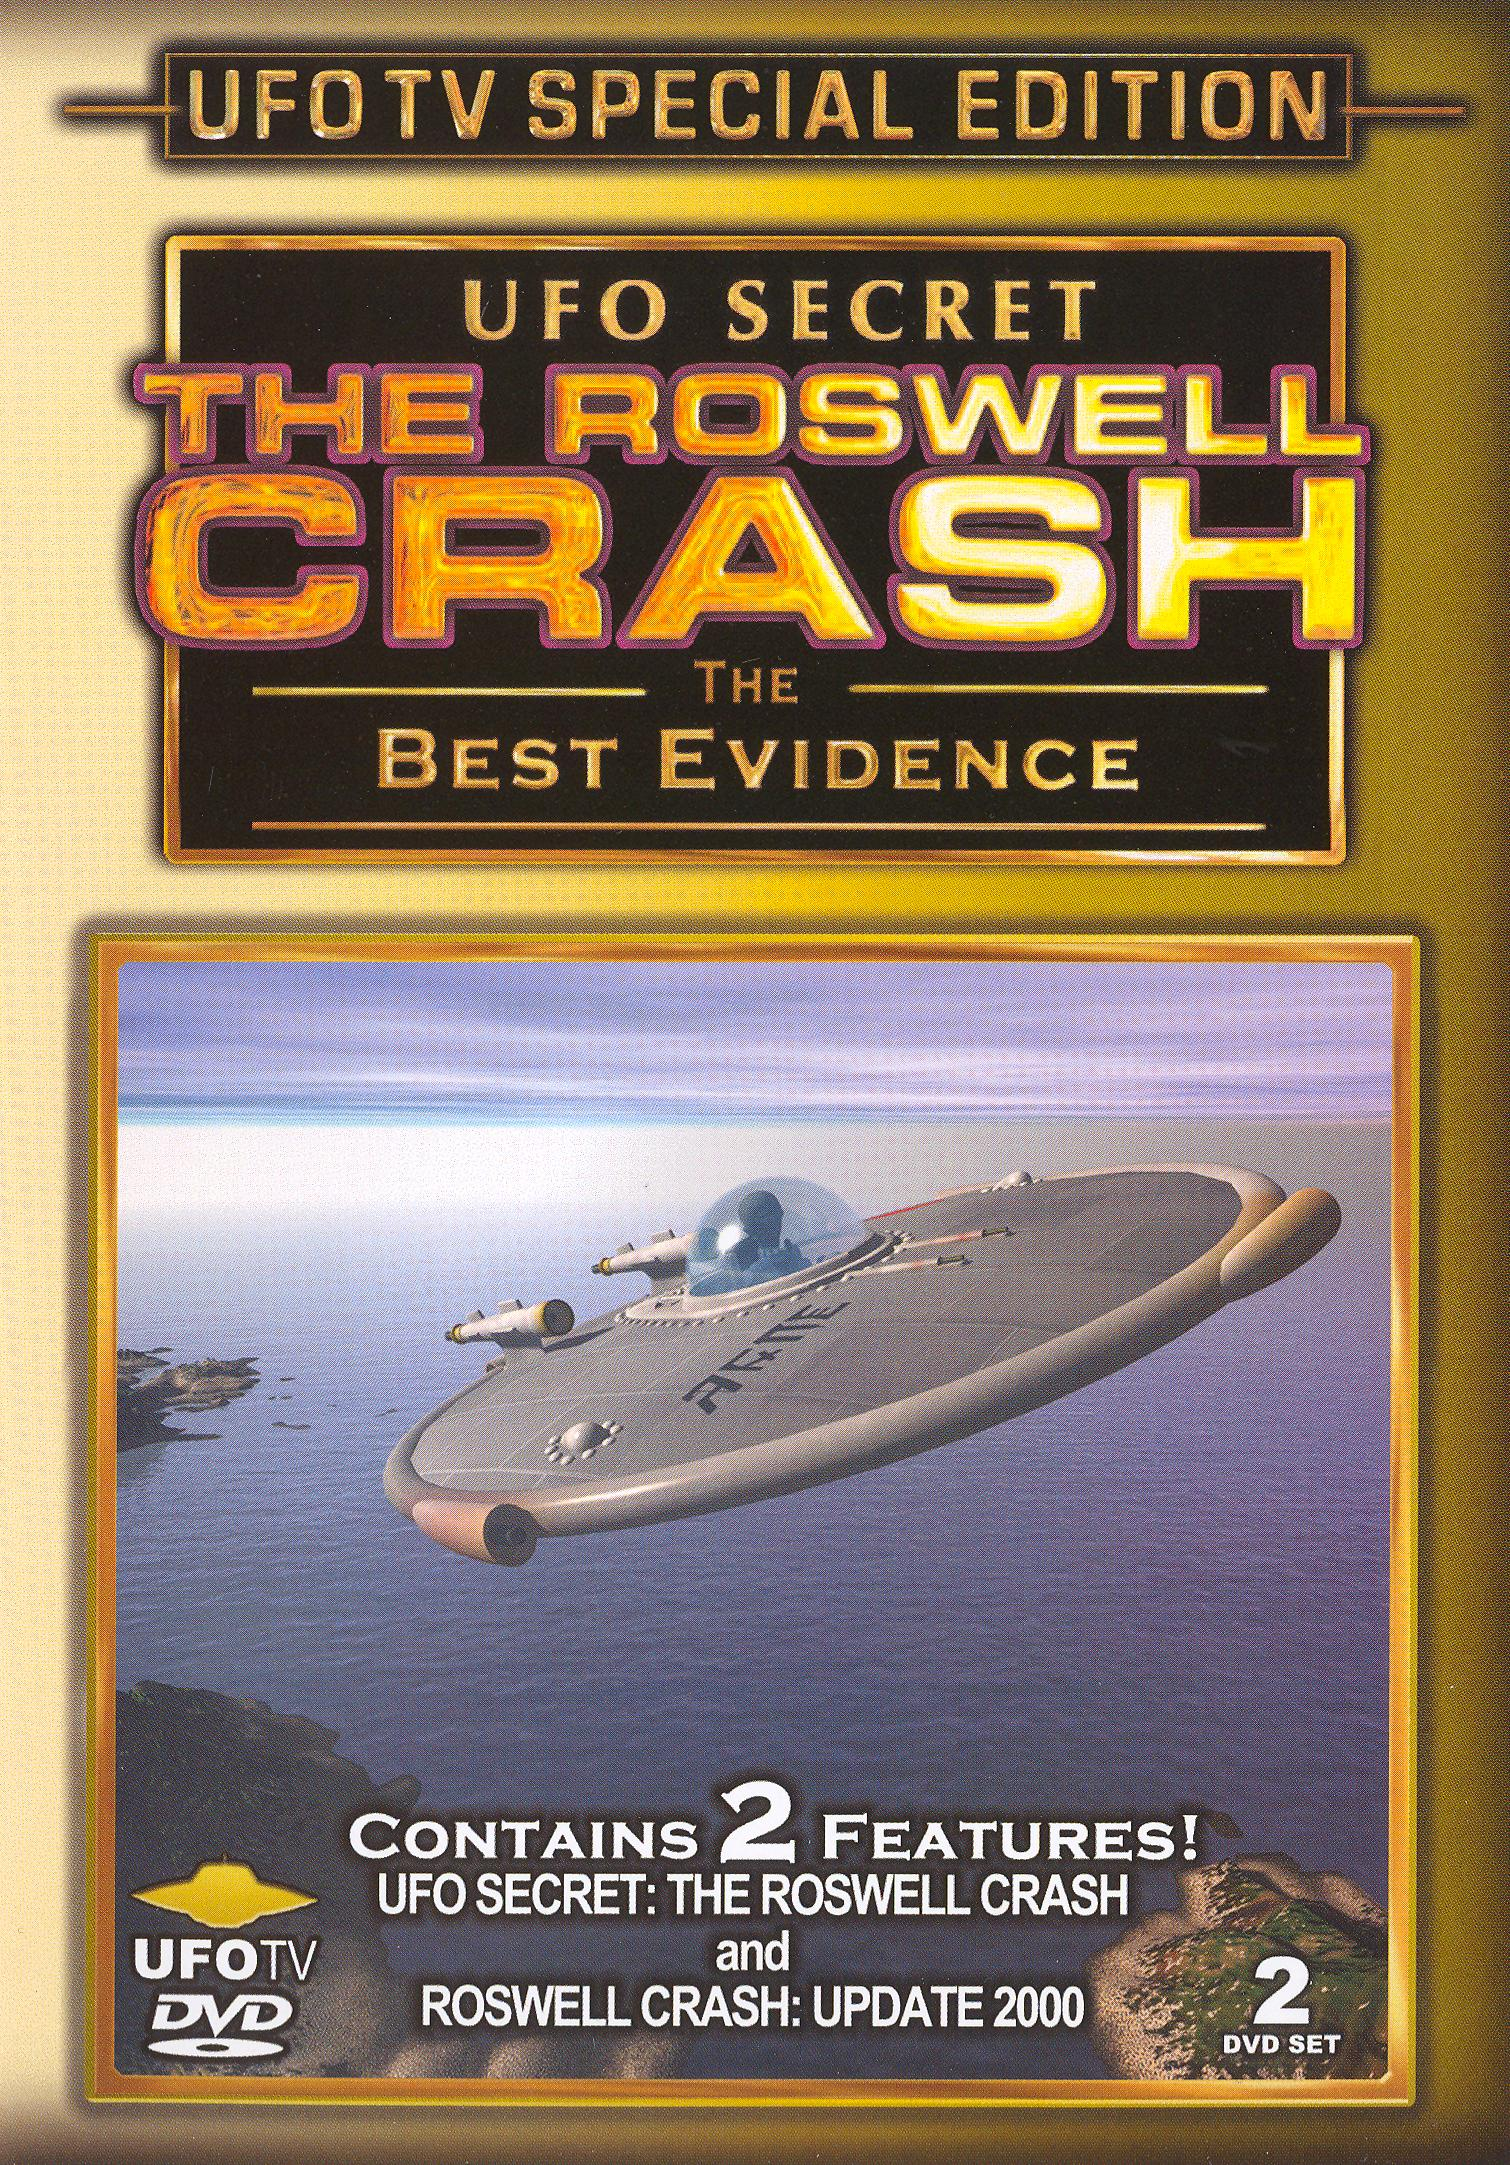 UFO Secret: The Roswell Crash